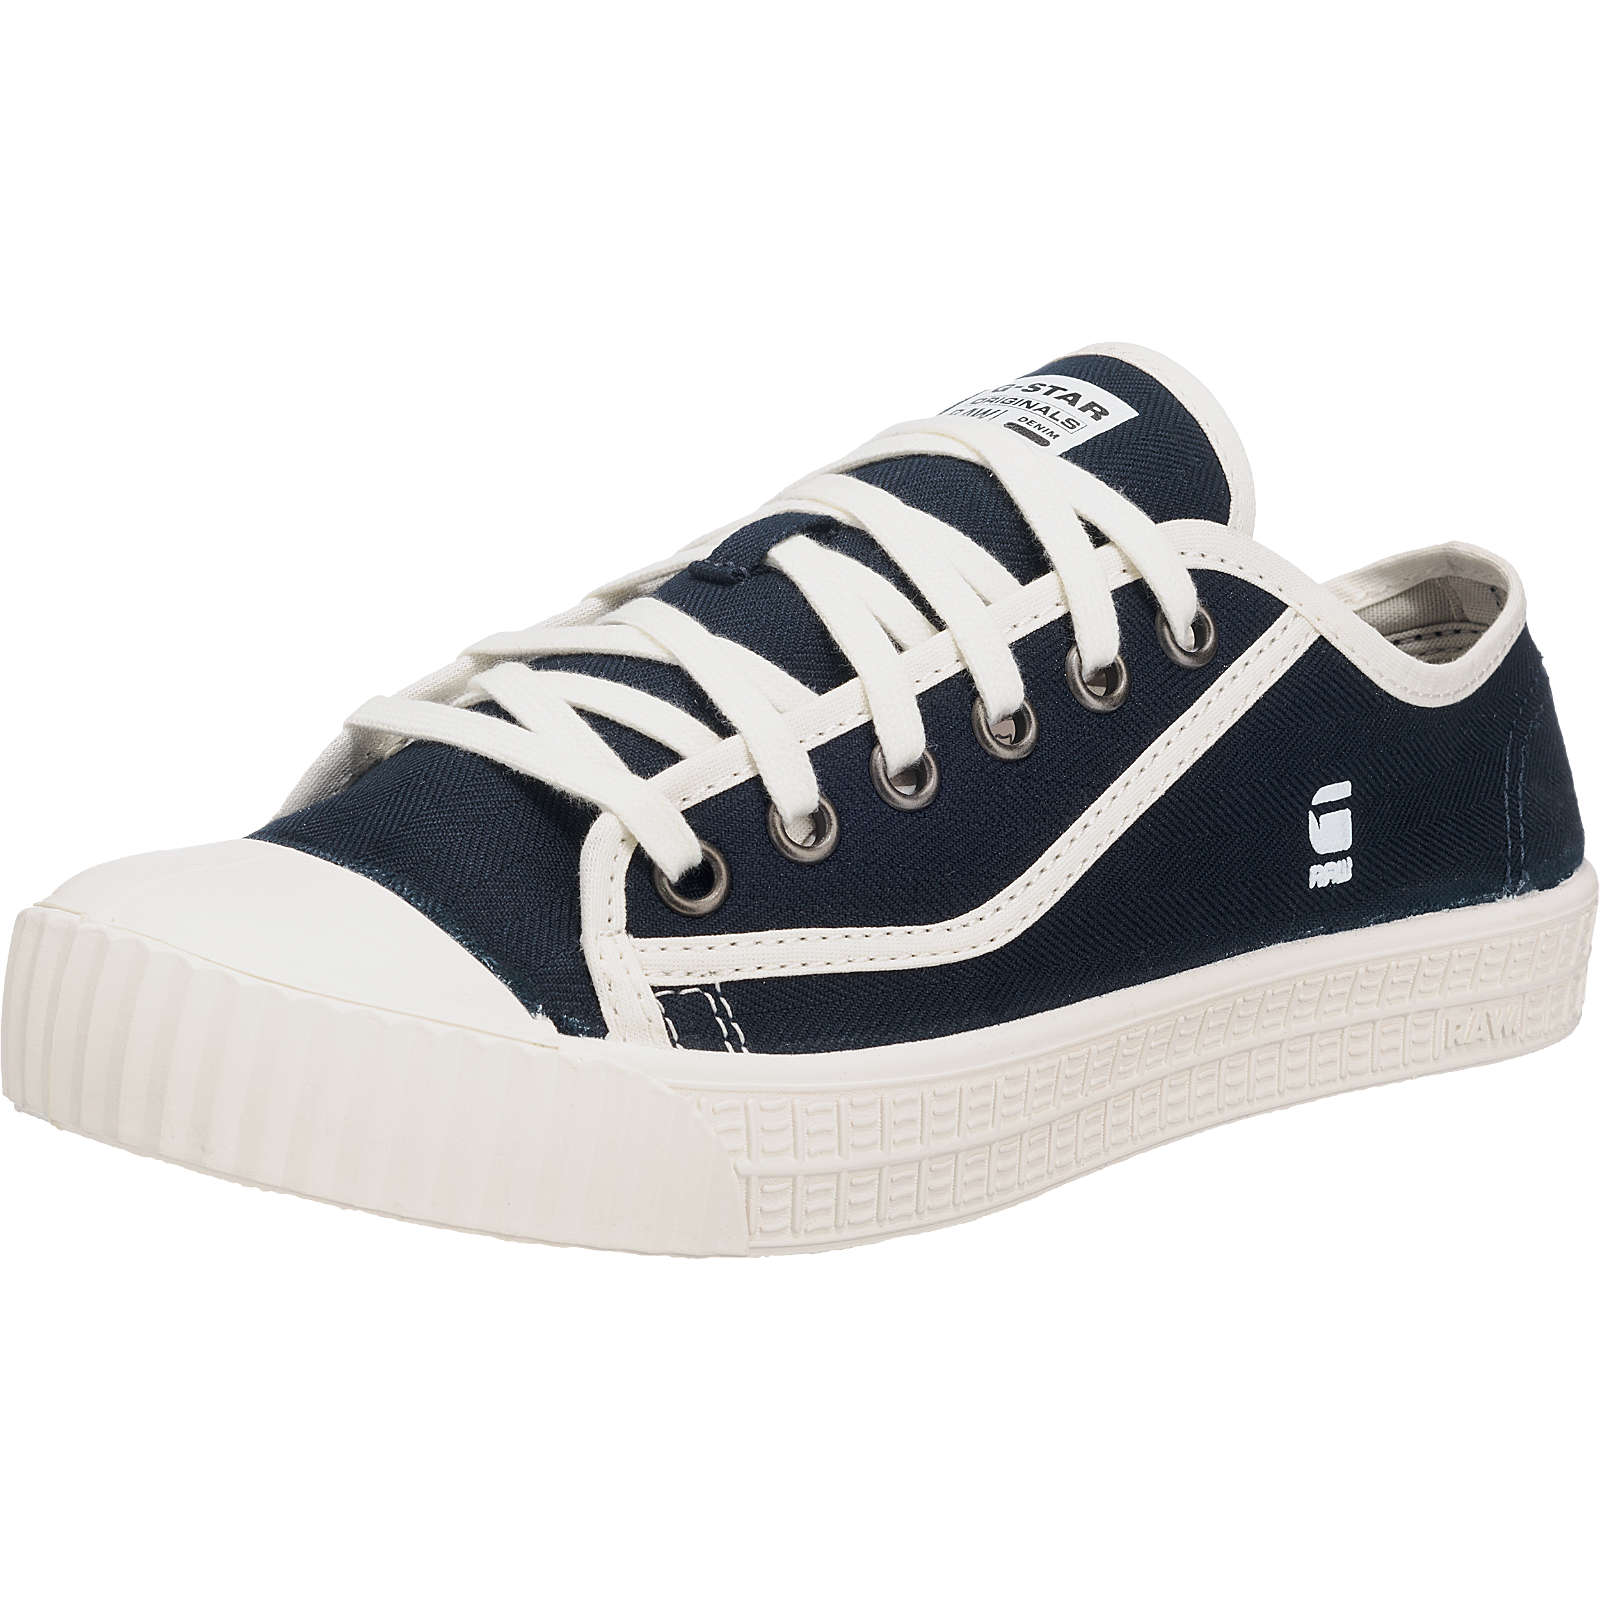 G-Star RAW ROVULC HB Sneakers Low dunkelblau Herren Gr. 42